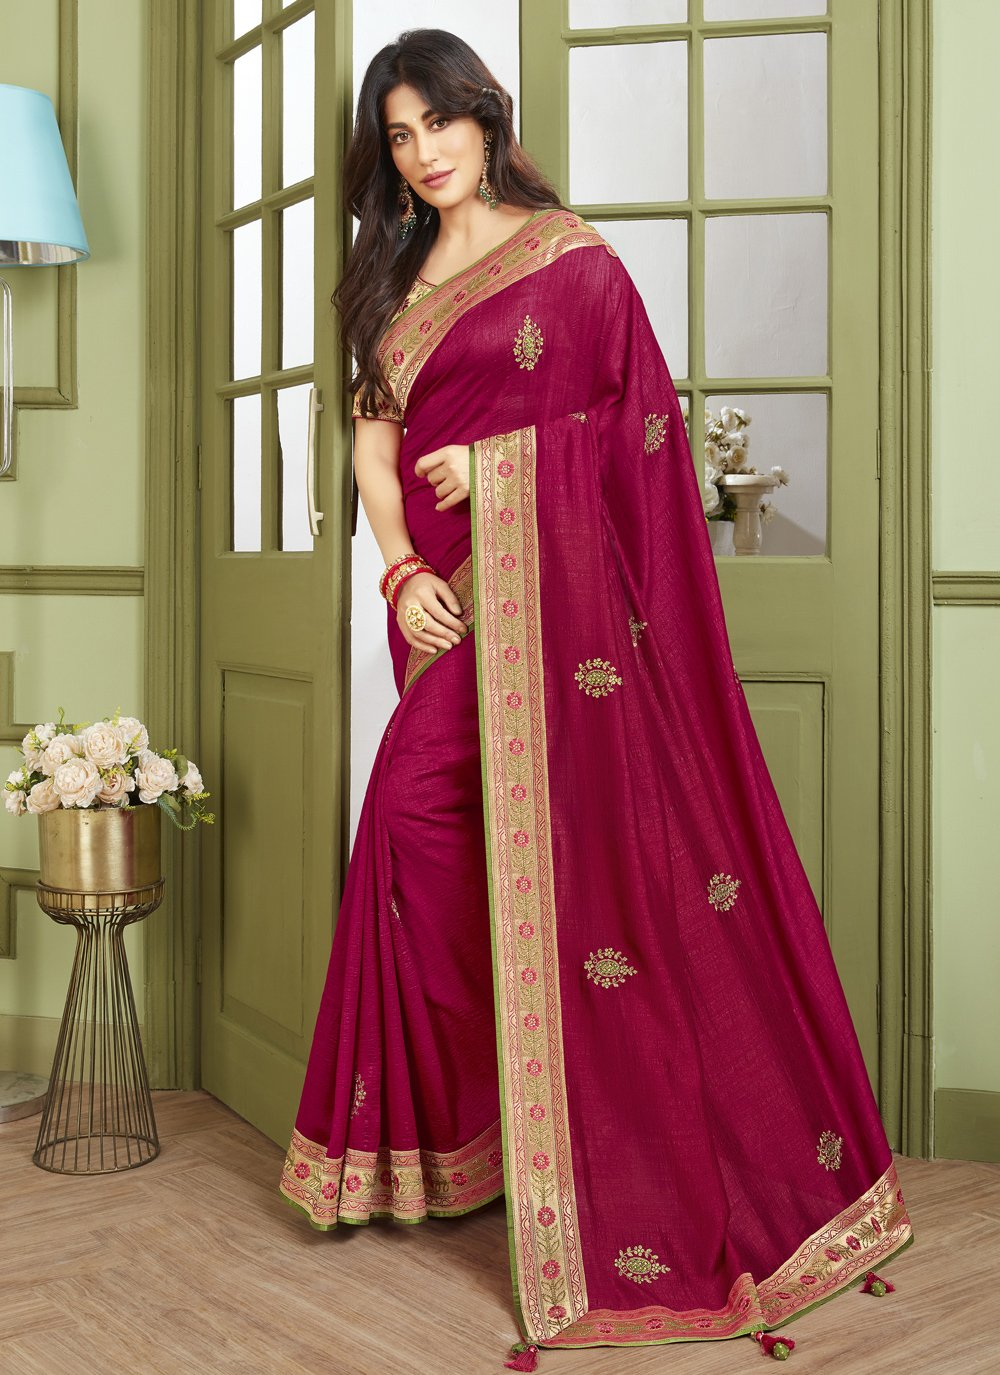 Chitrangada Singh Fancy Fabric Magenta Patch Border Traditional Designer Saree